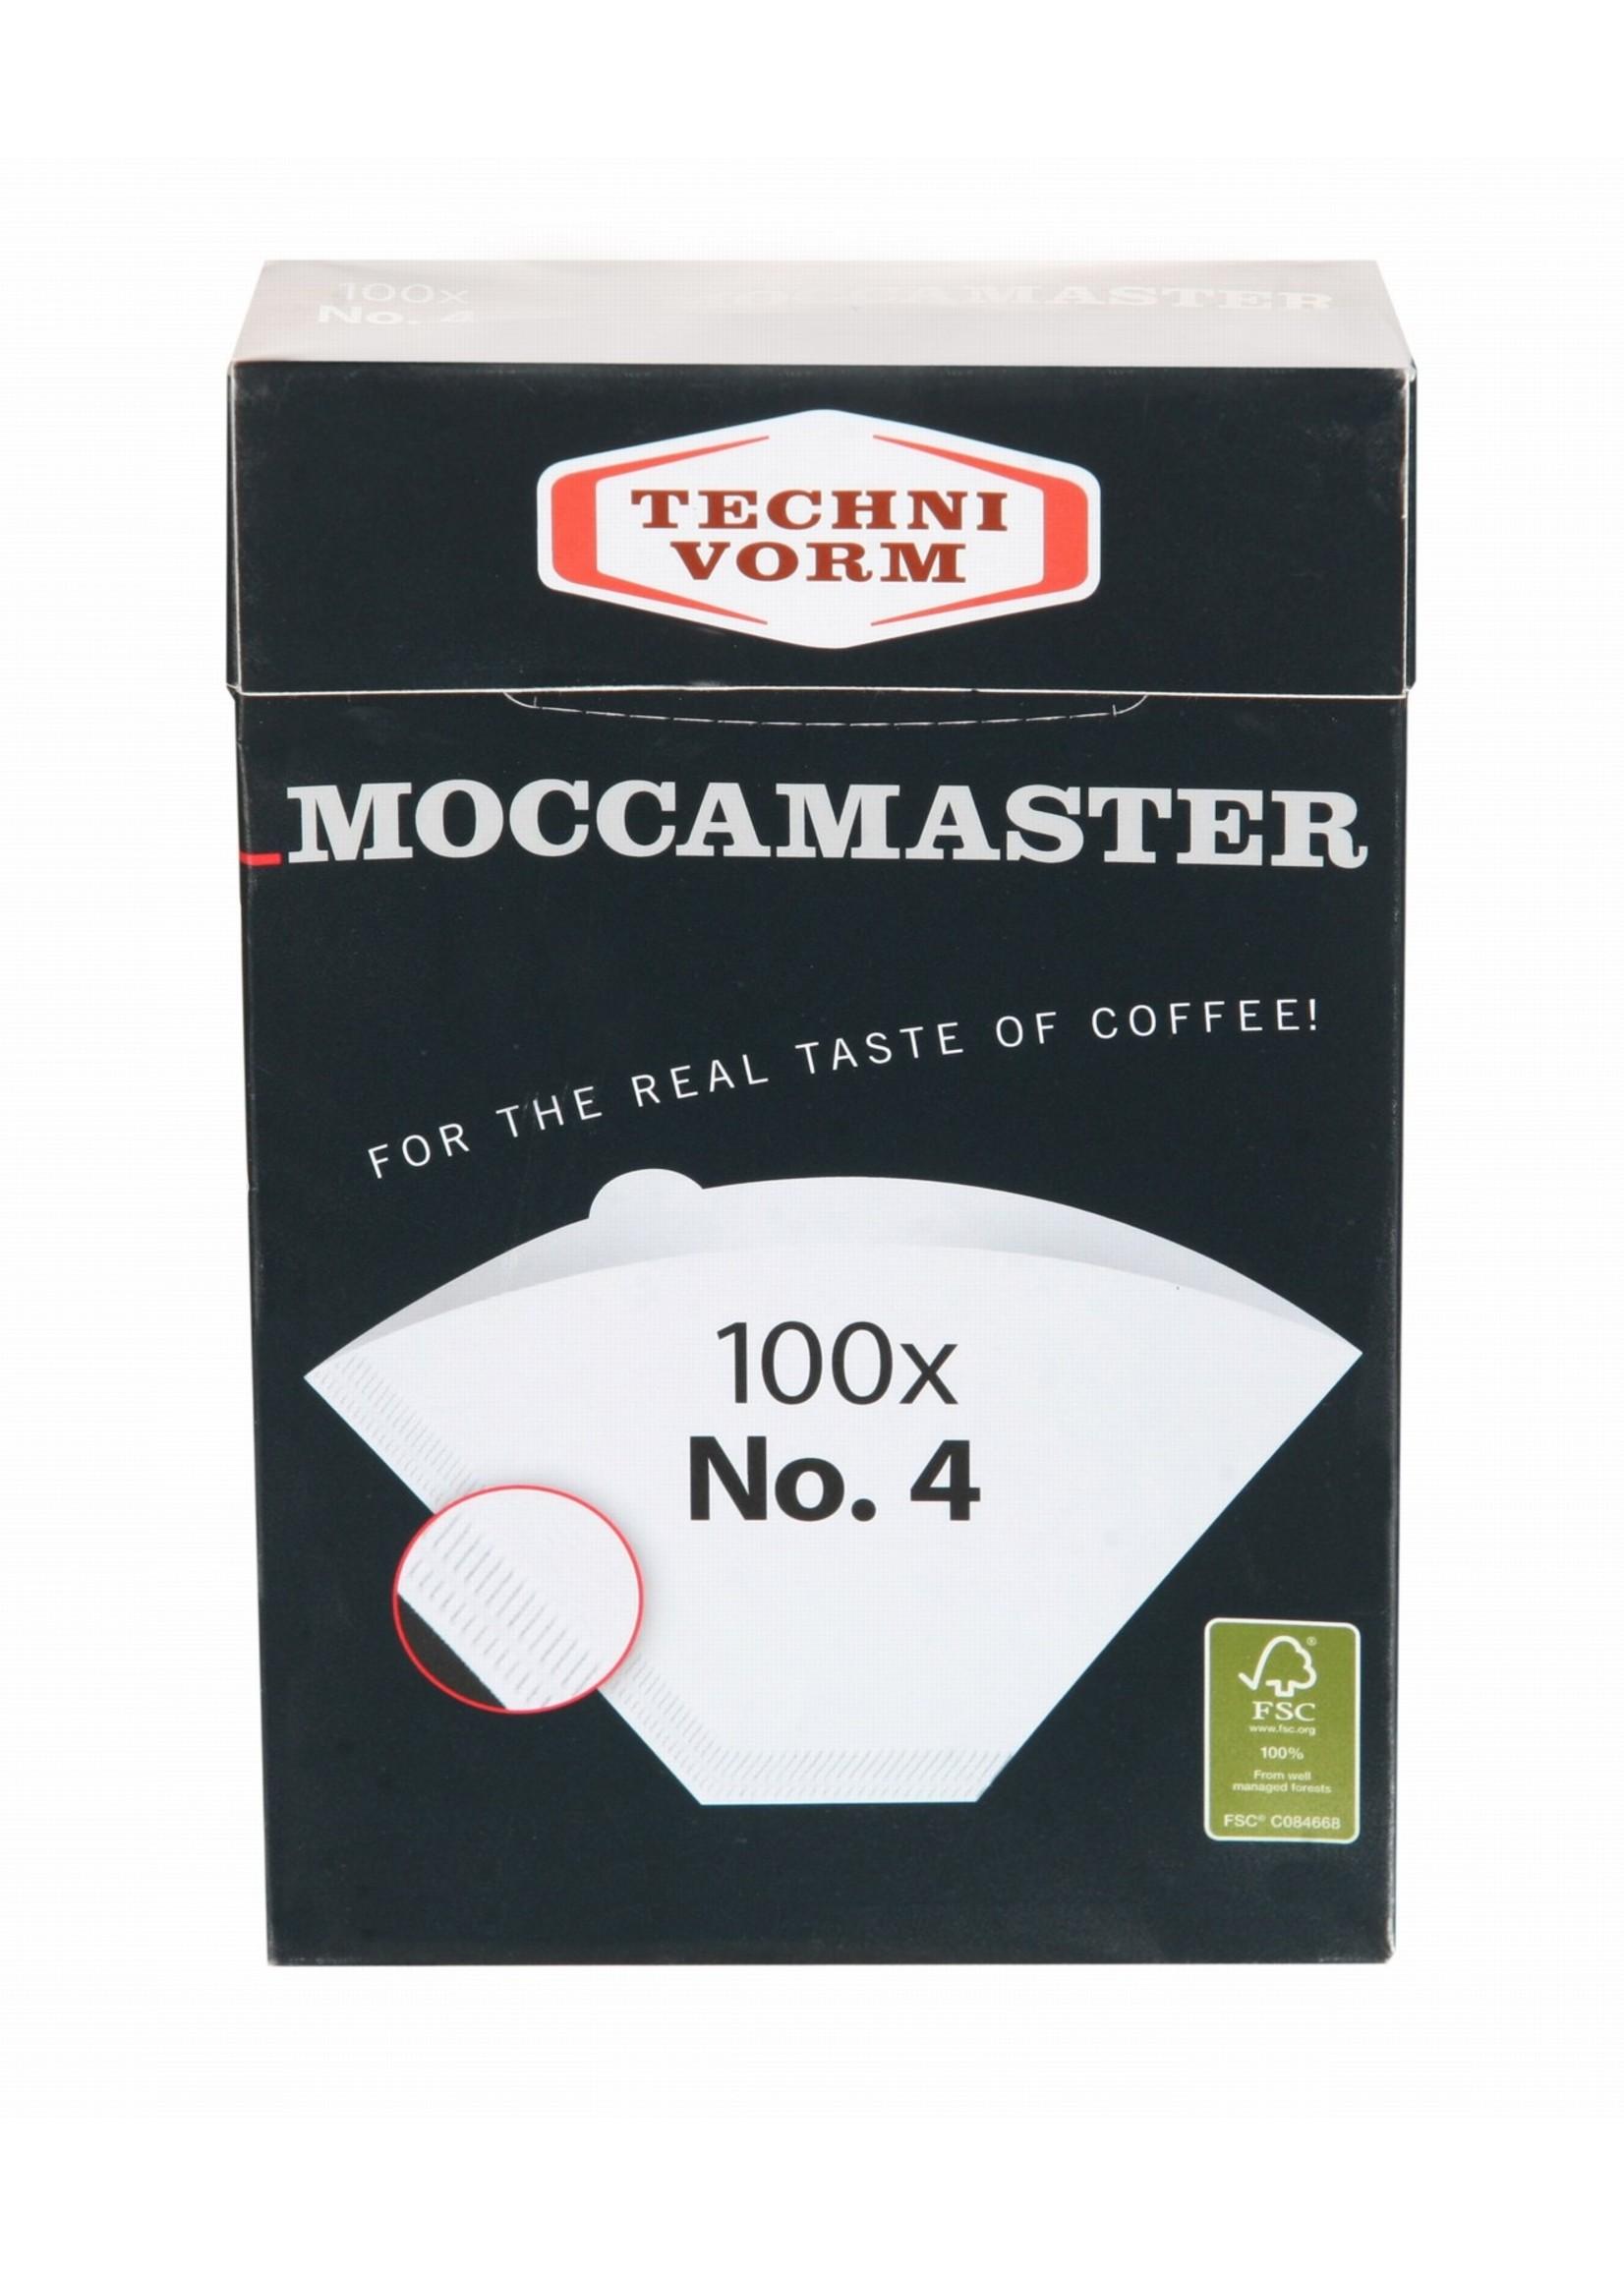 Mocca Master Moccamaster filterzakjes nr. 4 (100 st.)